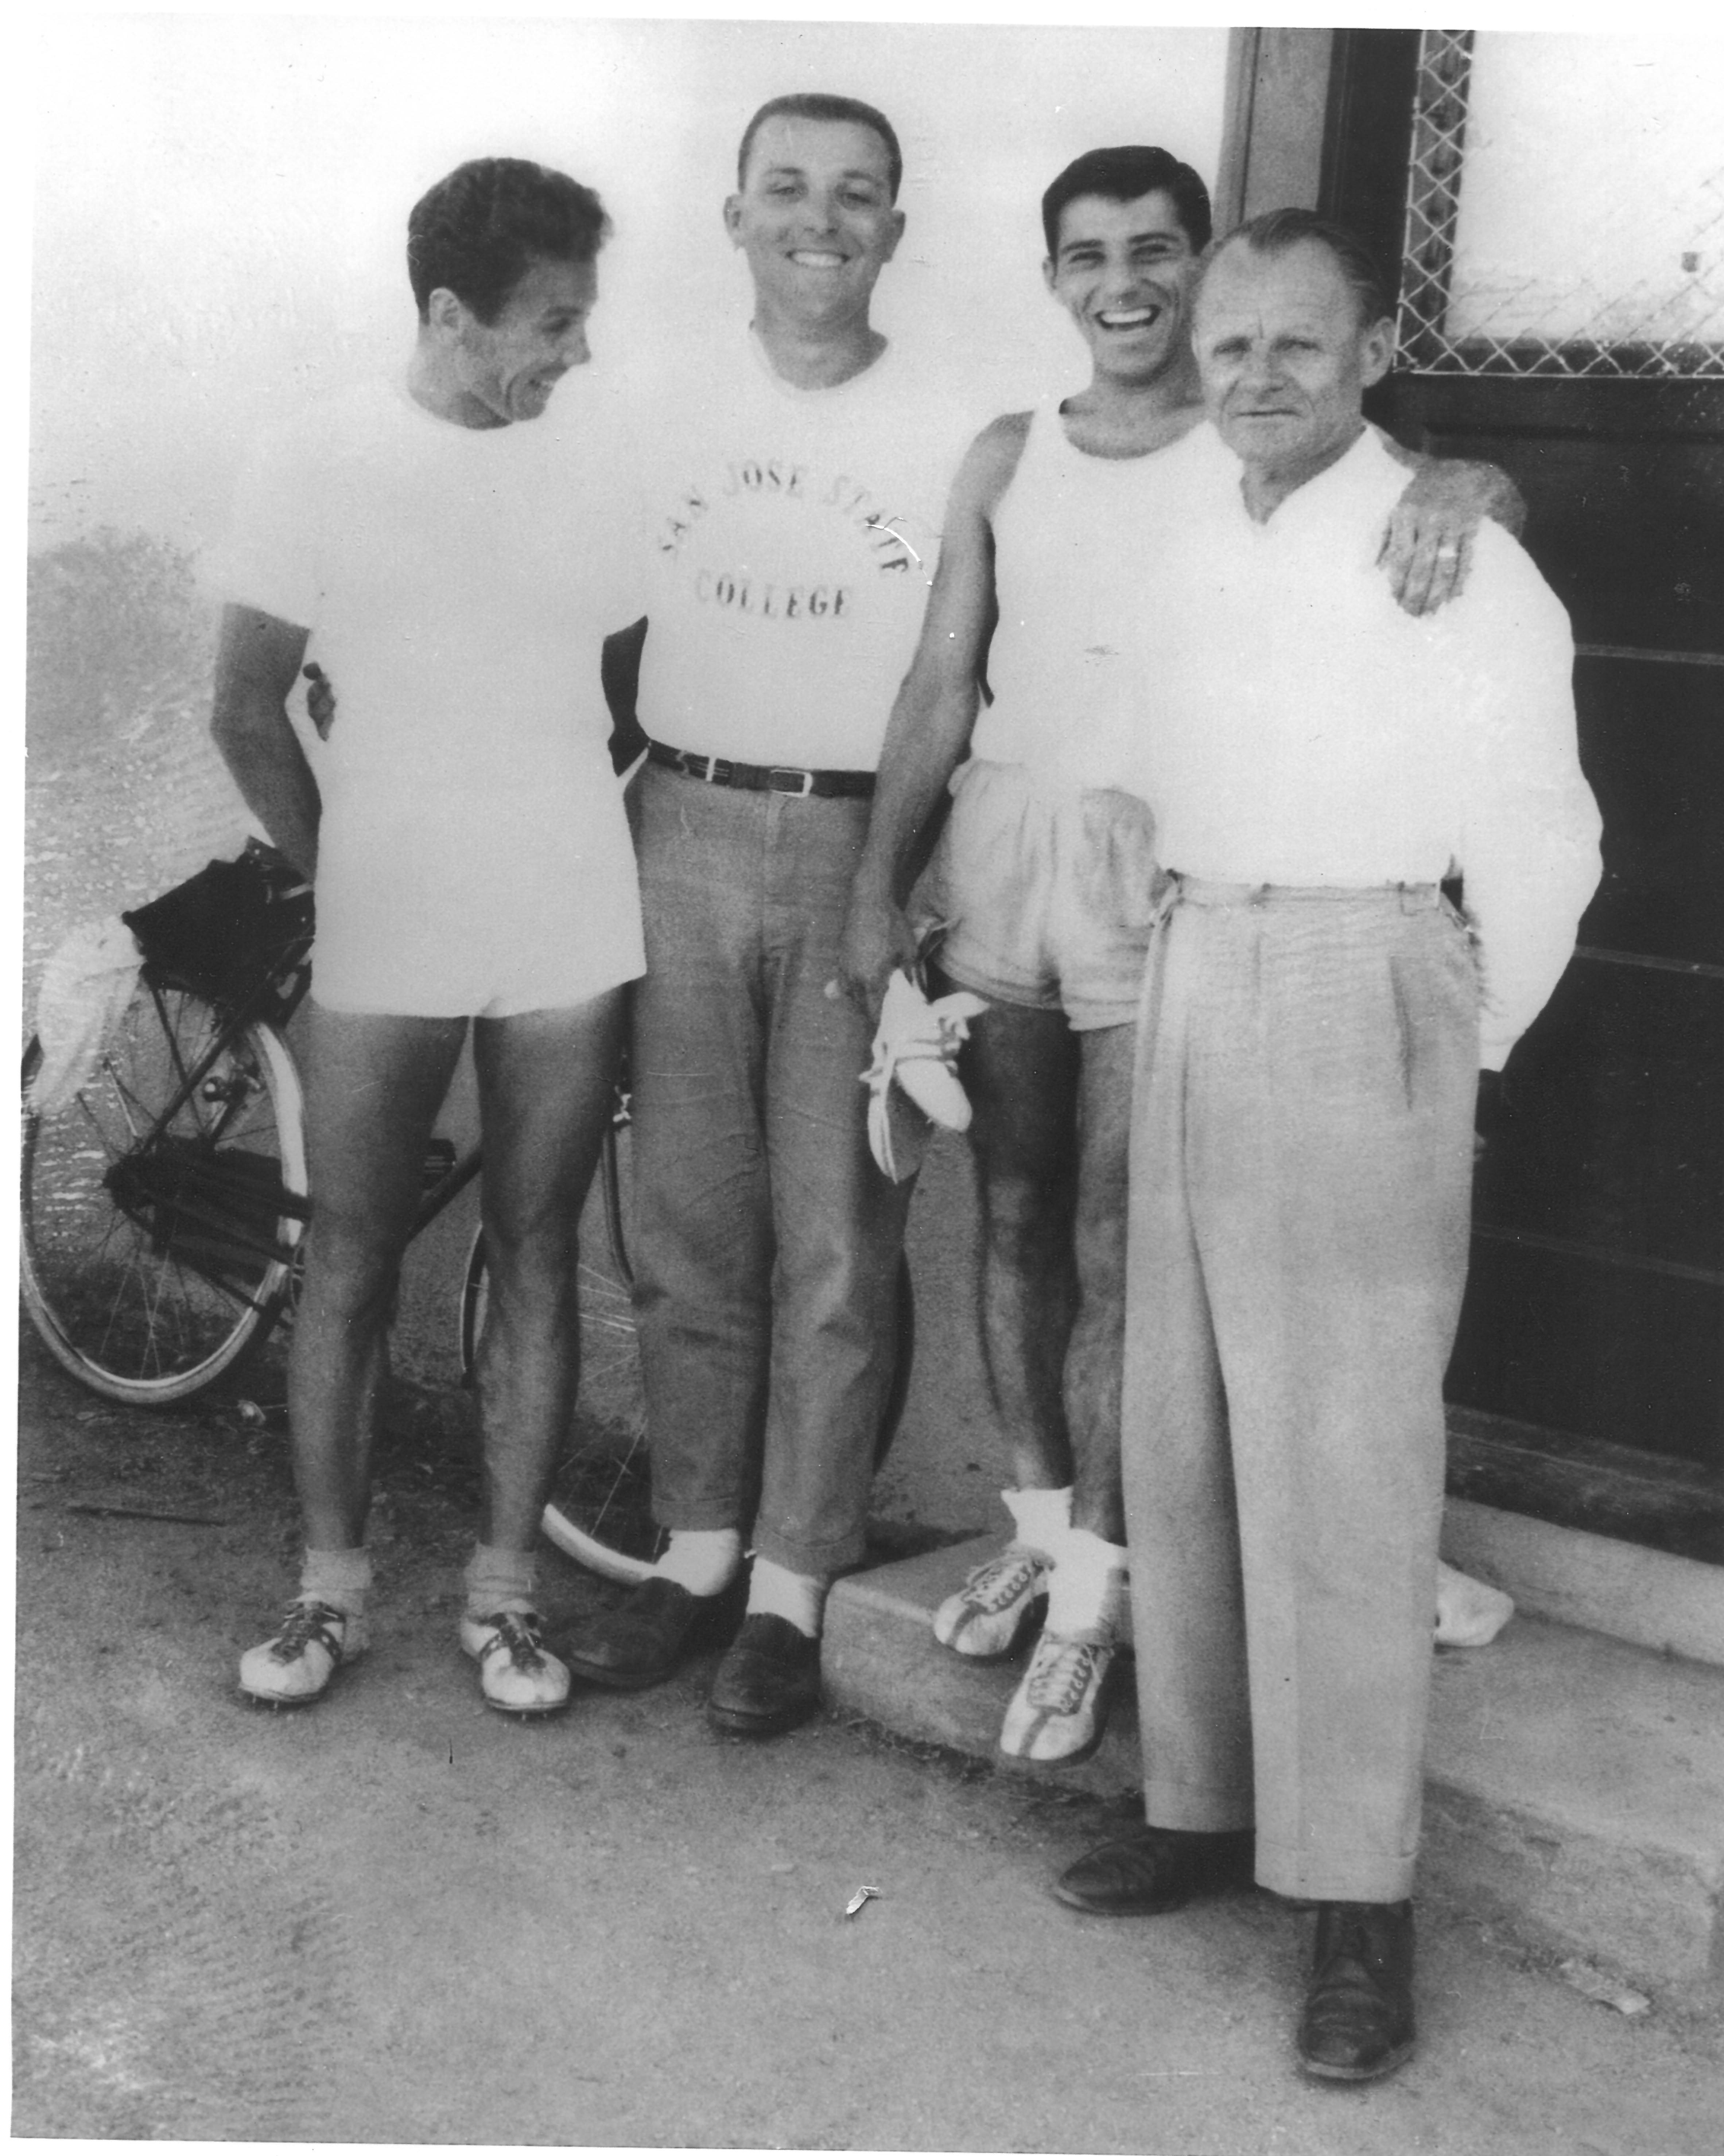 Bonanno with athletes